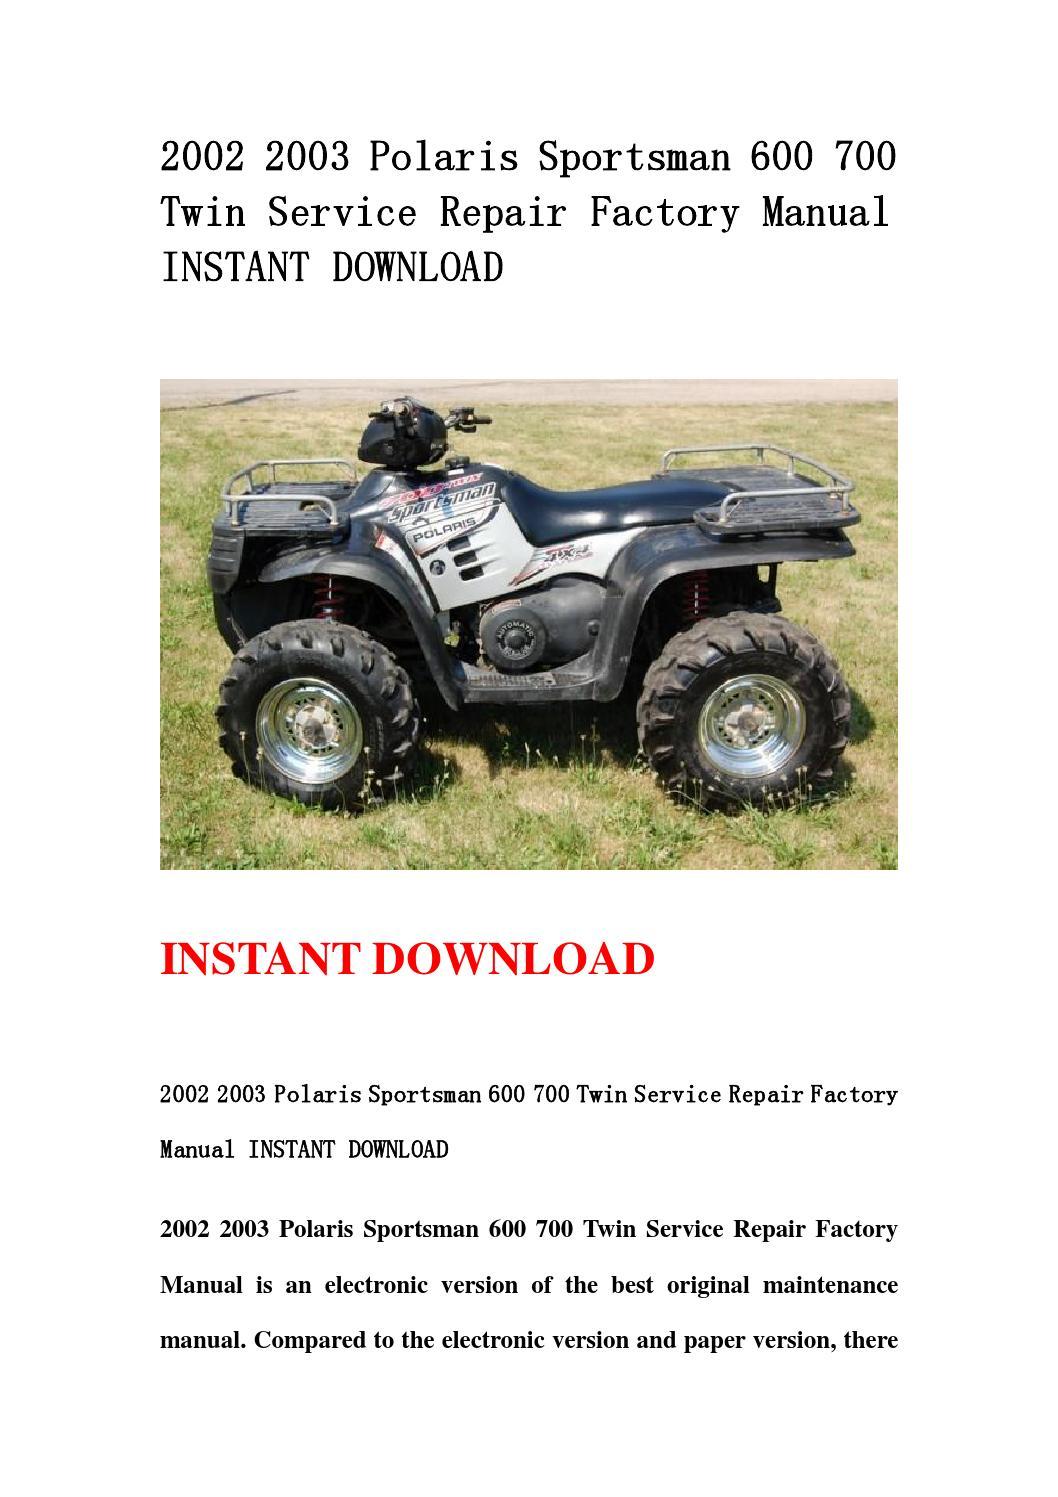 2002 2003 Polaris Sportsman 600 700 Twin Service Repair